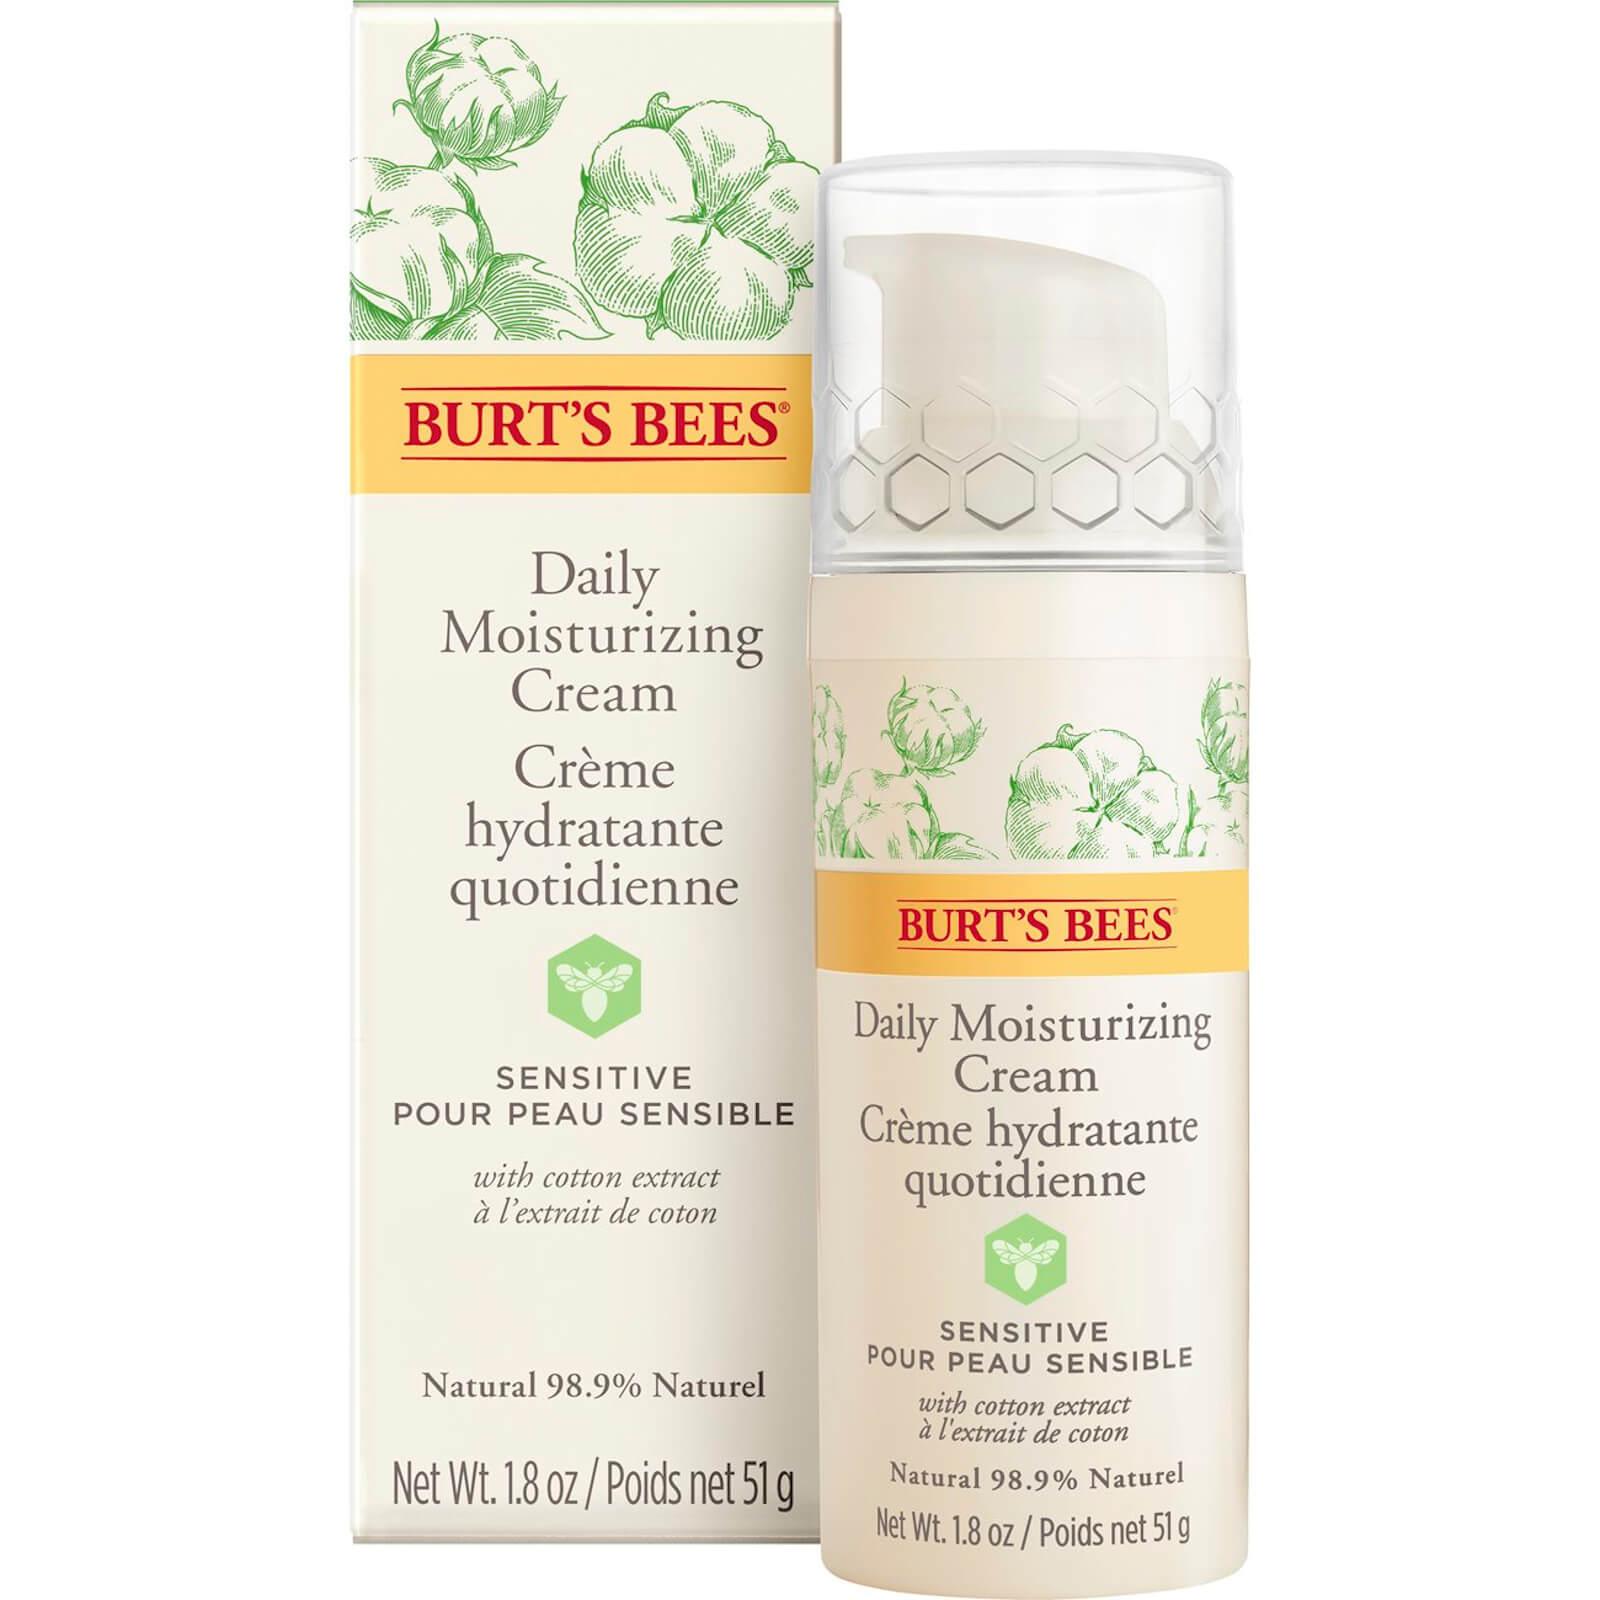 Burt's Bees Sensitive Daily Moisturising Cream 50g